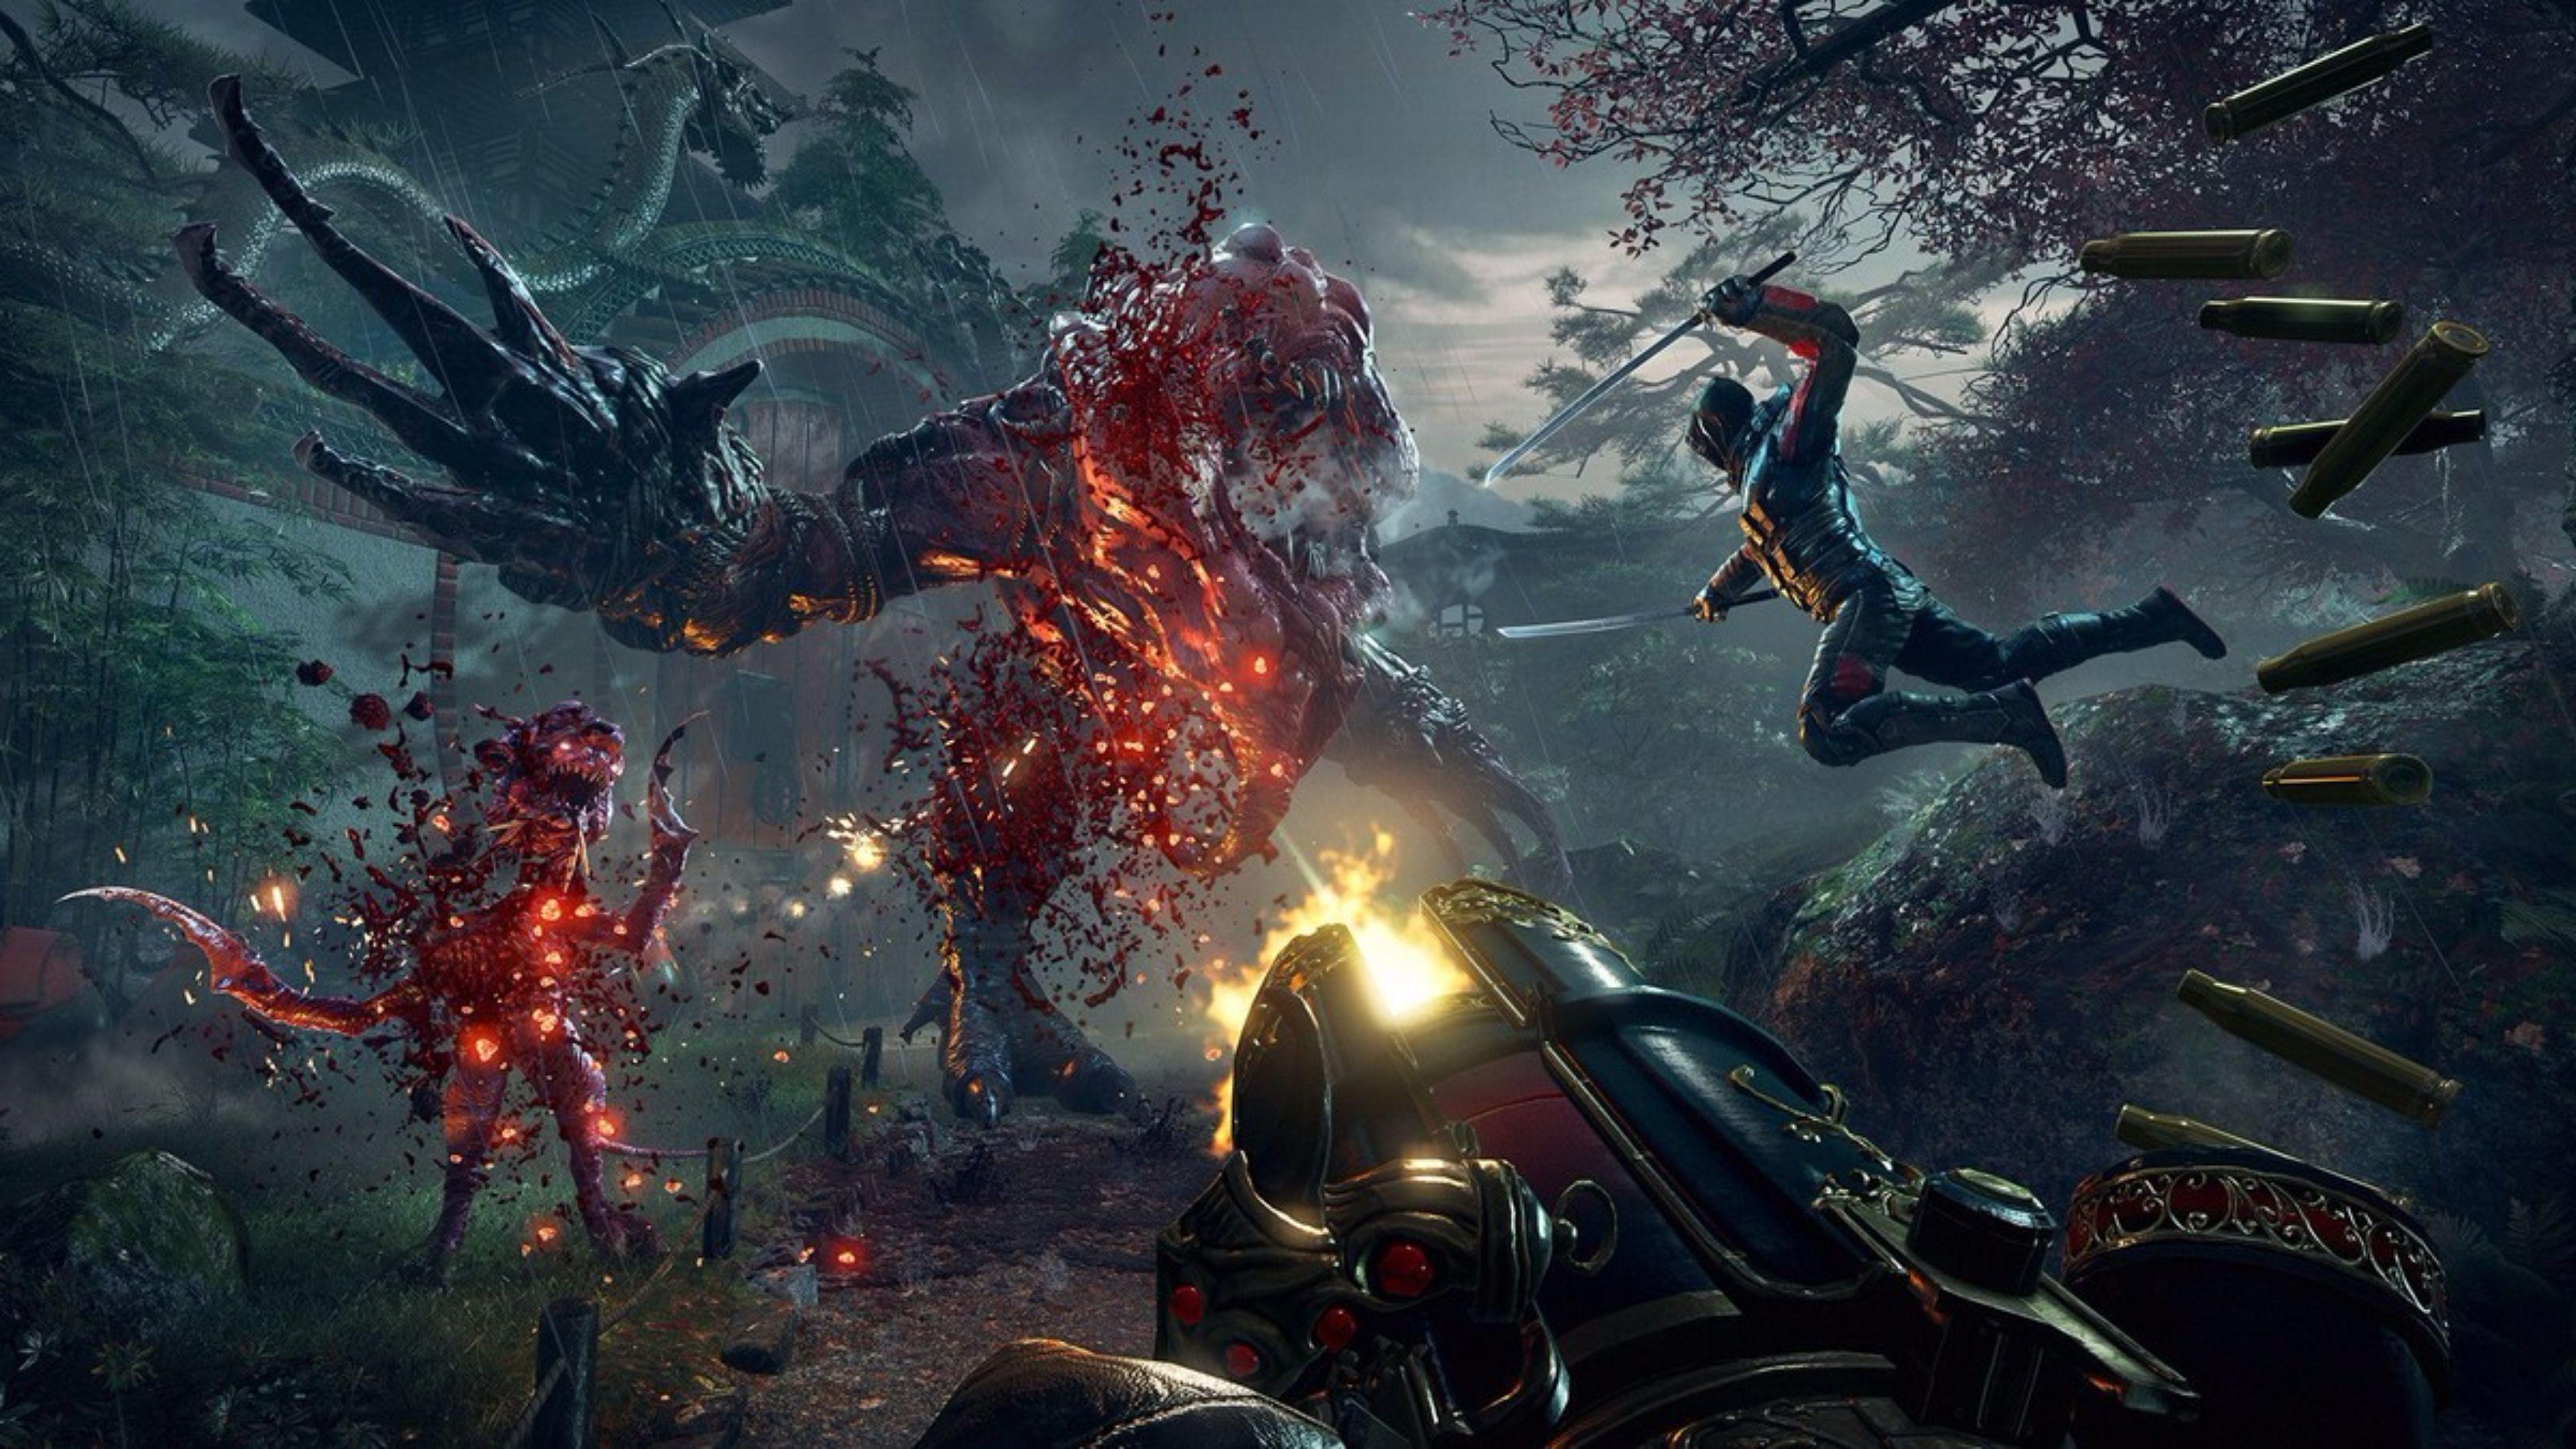 Deus Ex Wallpaper 76 Pictures